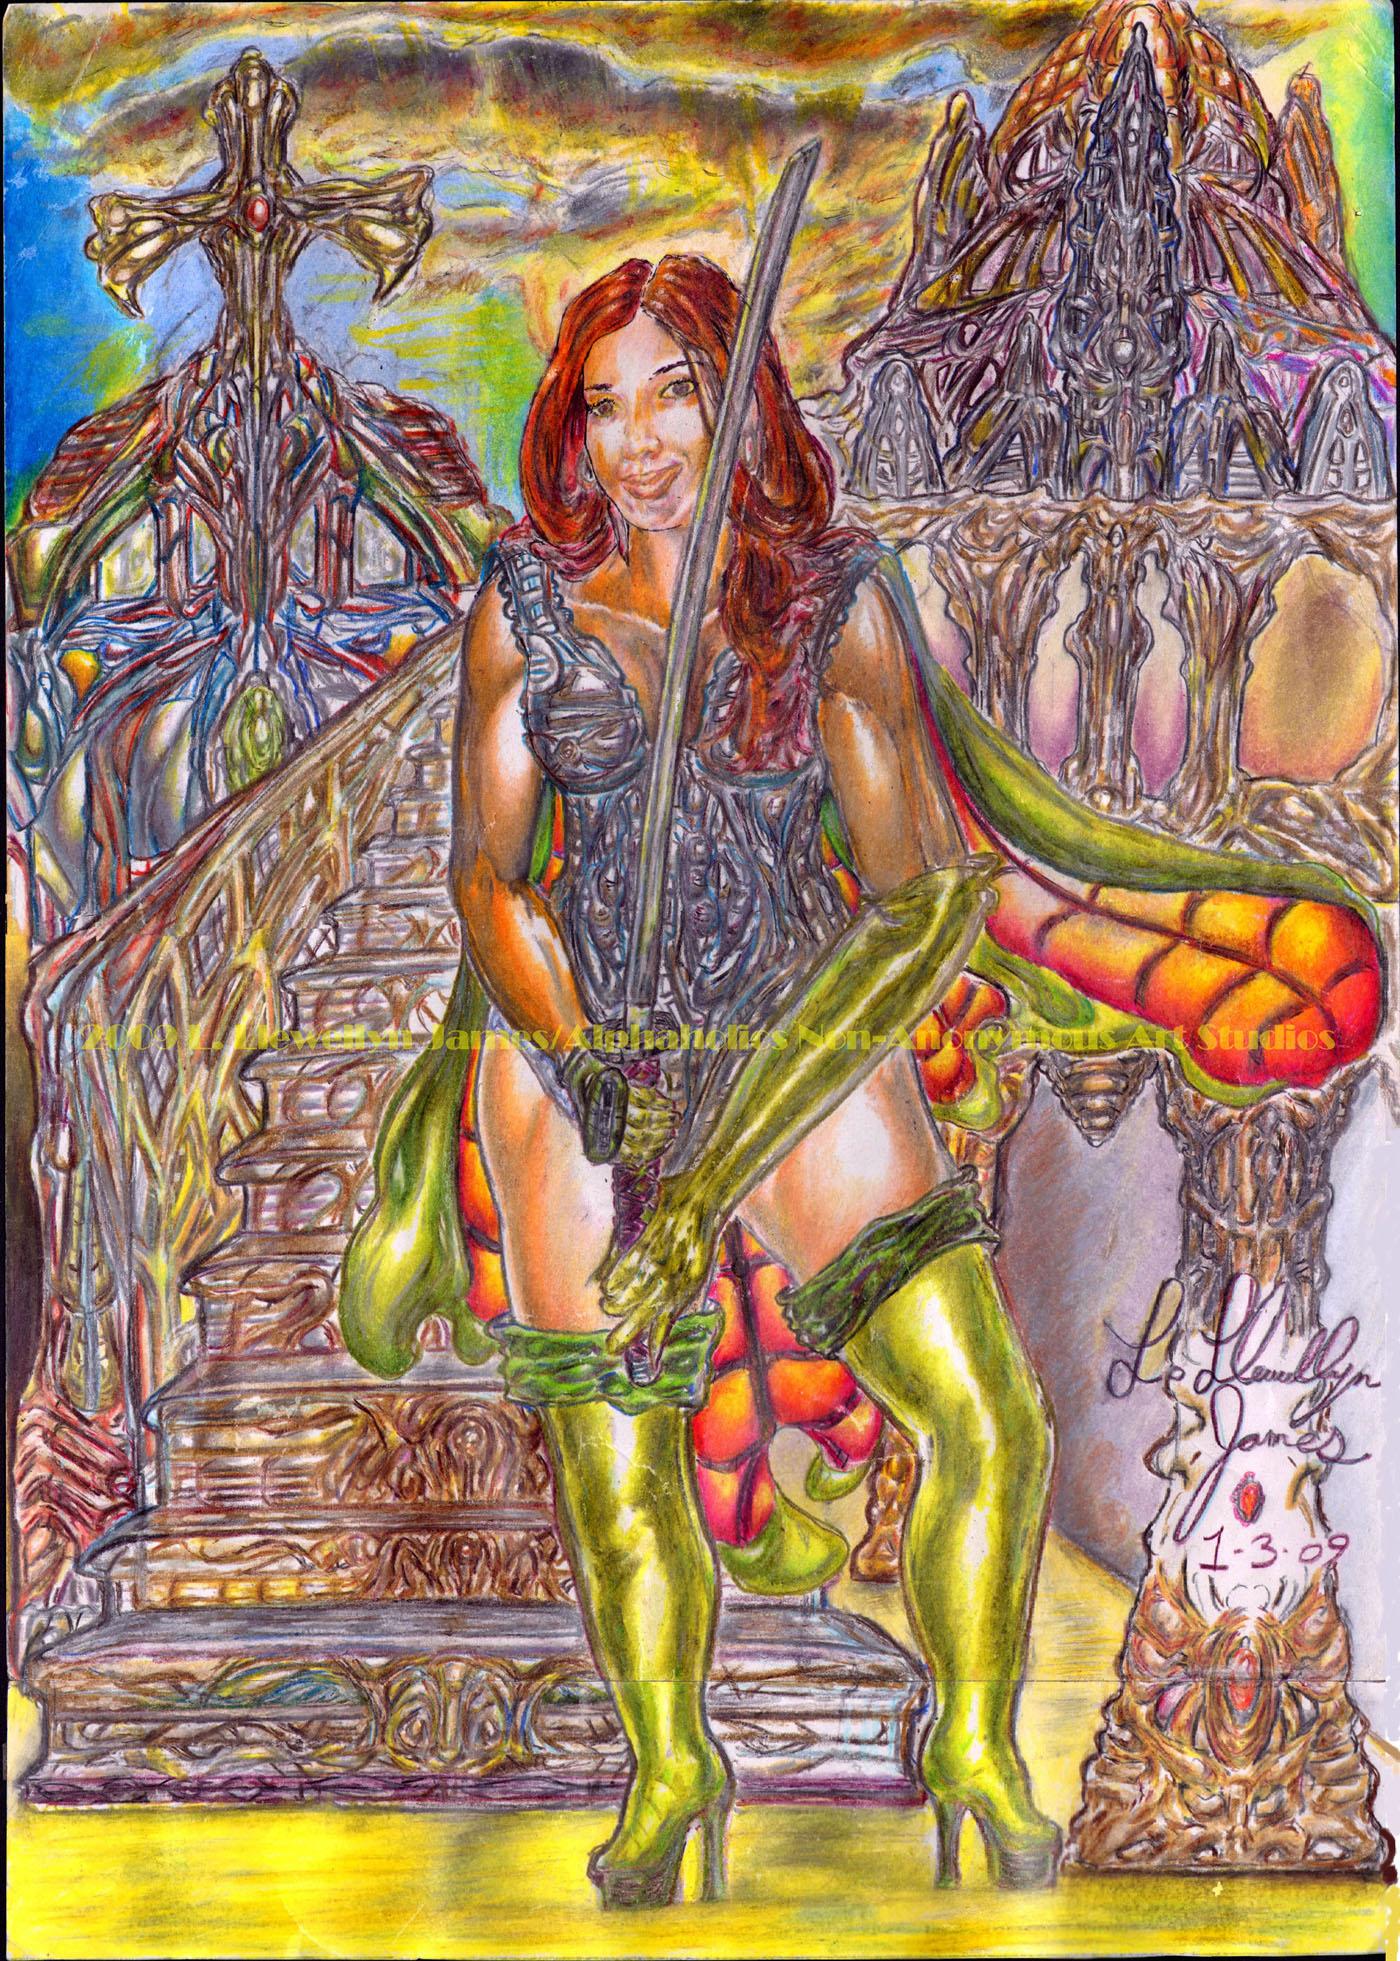 The Legend of El Ciderella